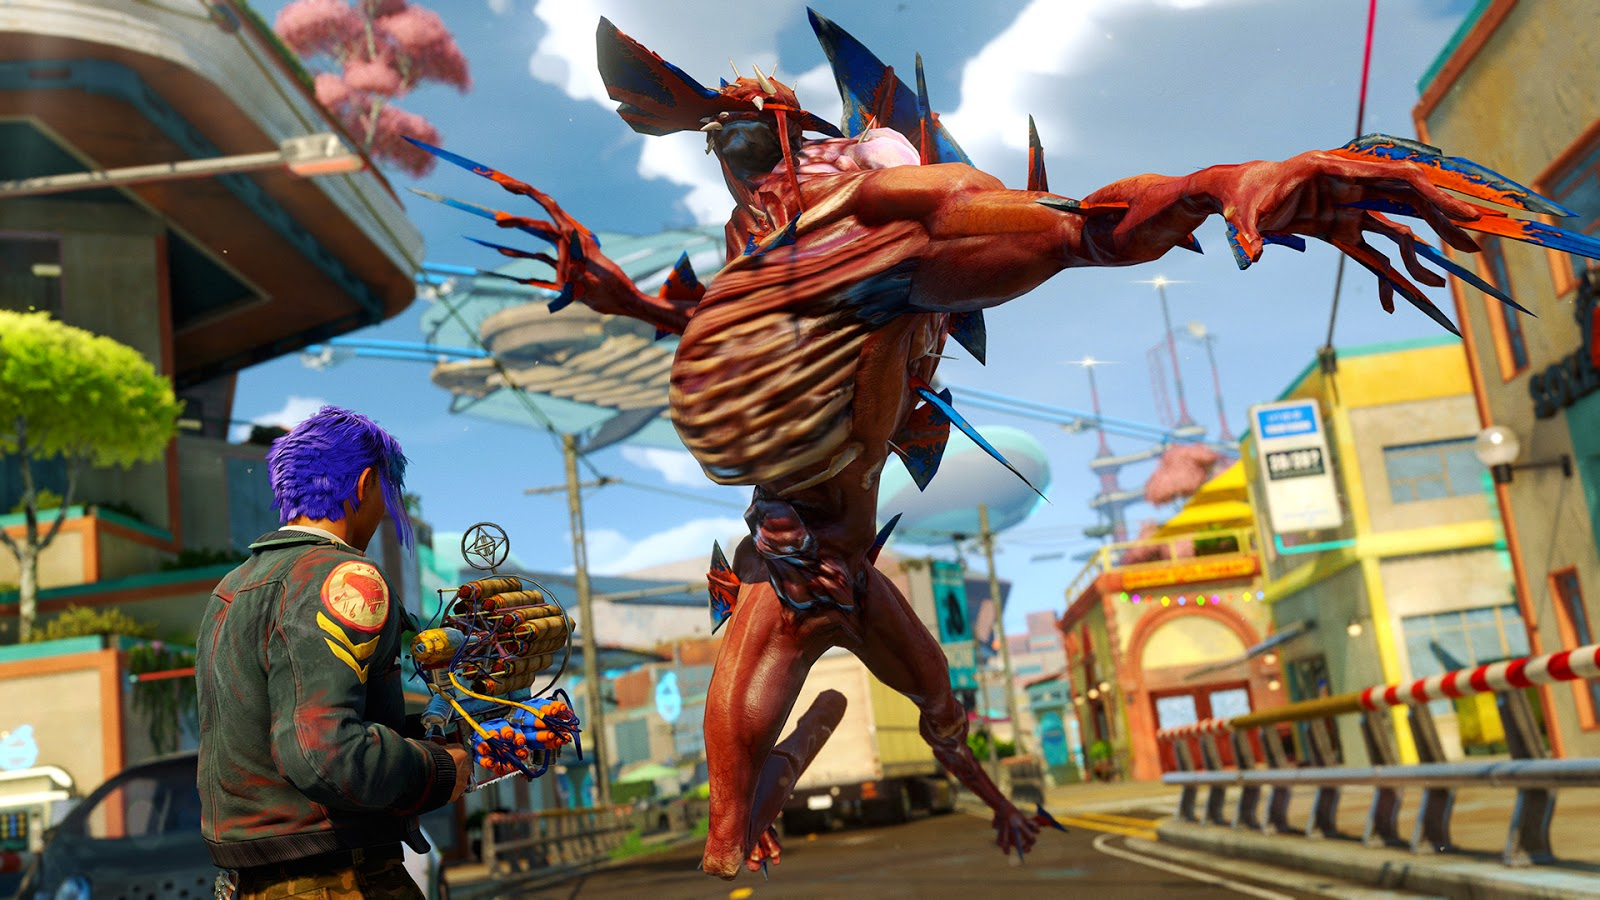 Celebra el primer año del Xbox One con 24 horas gratis de Sunset Overdrive